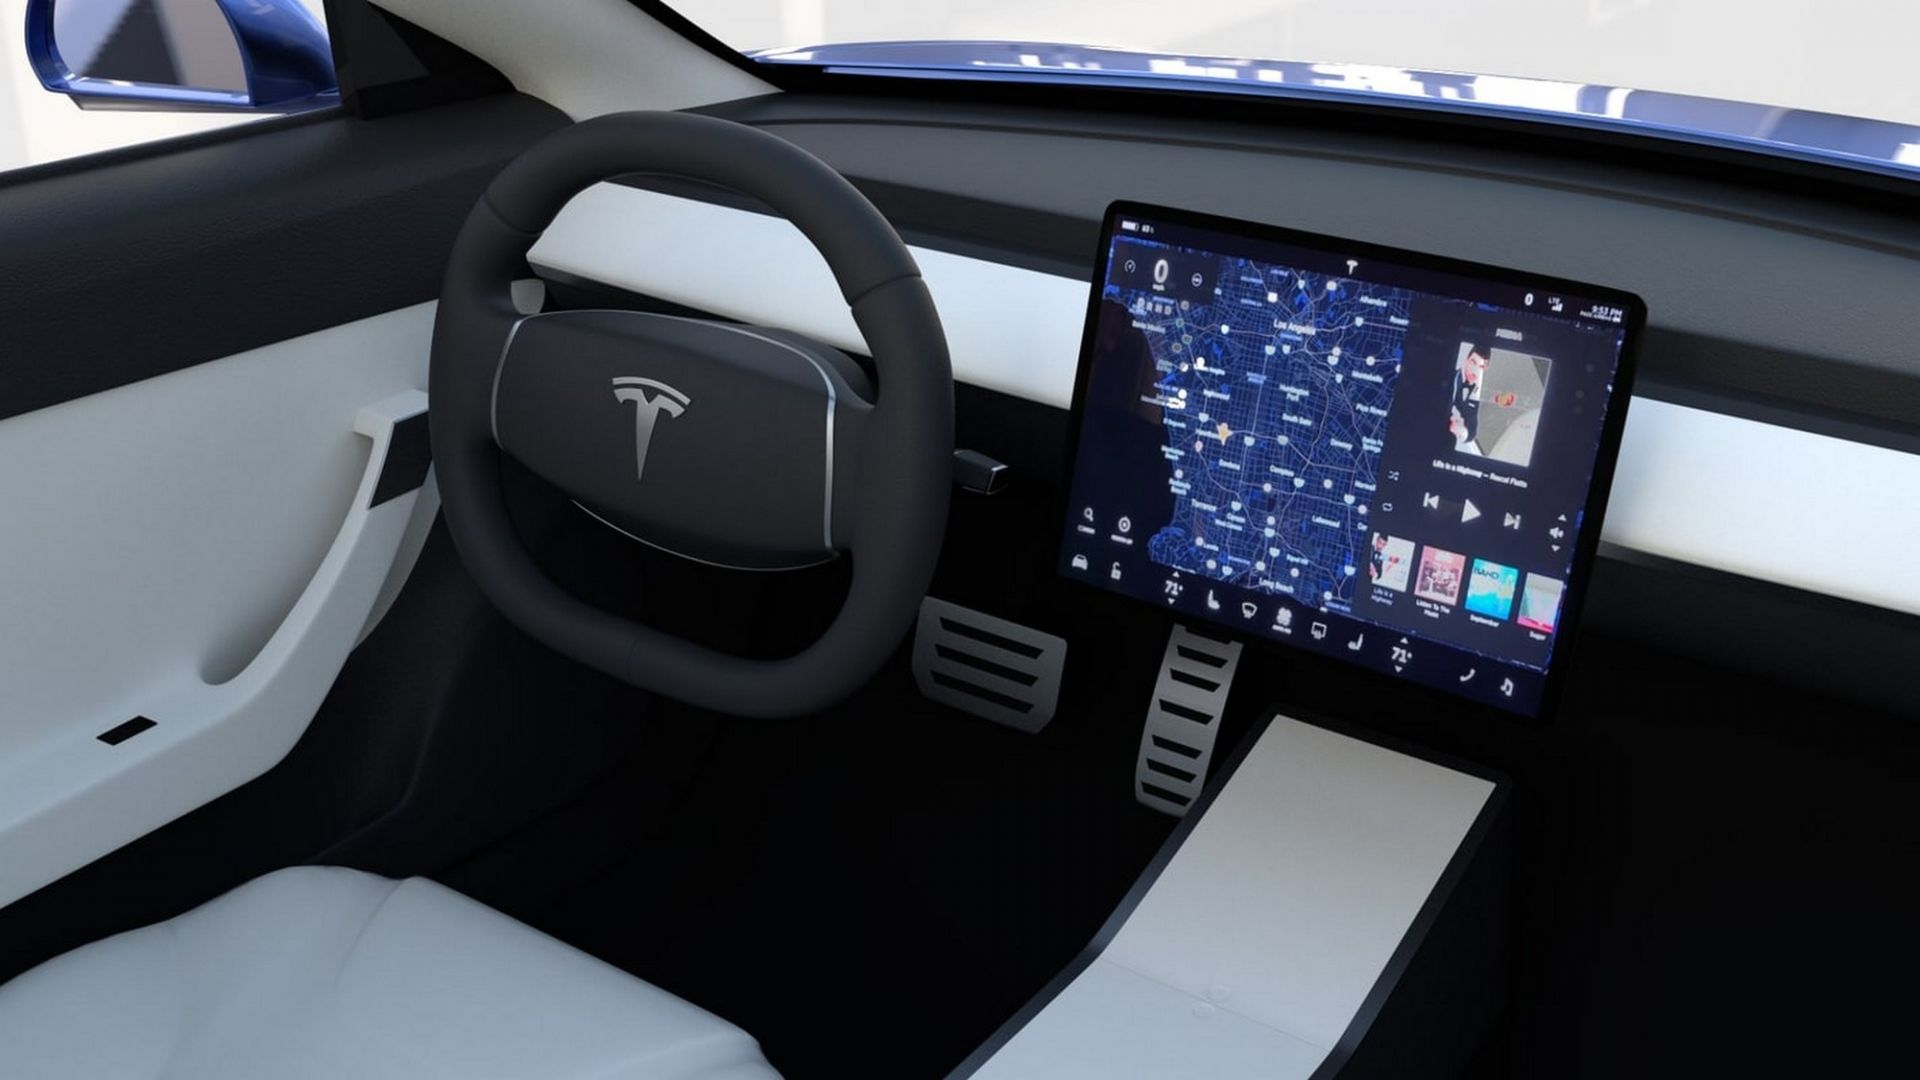 Tesla Model 3, prime consegne, prime lamentele. Manca ...